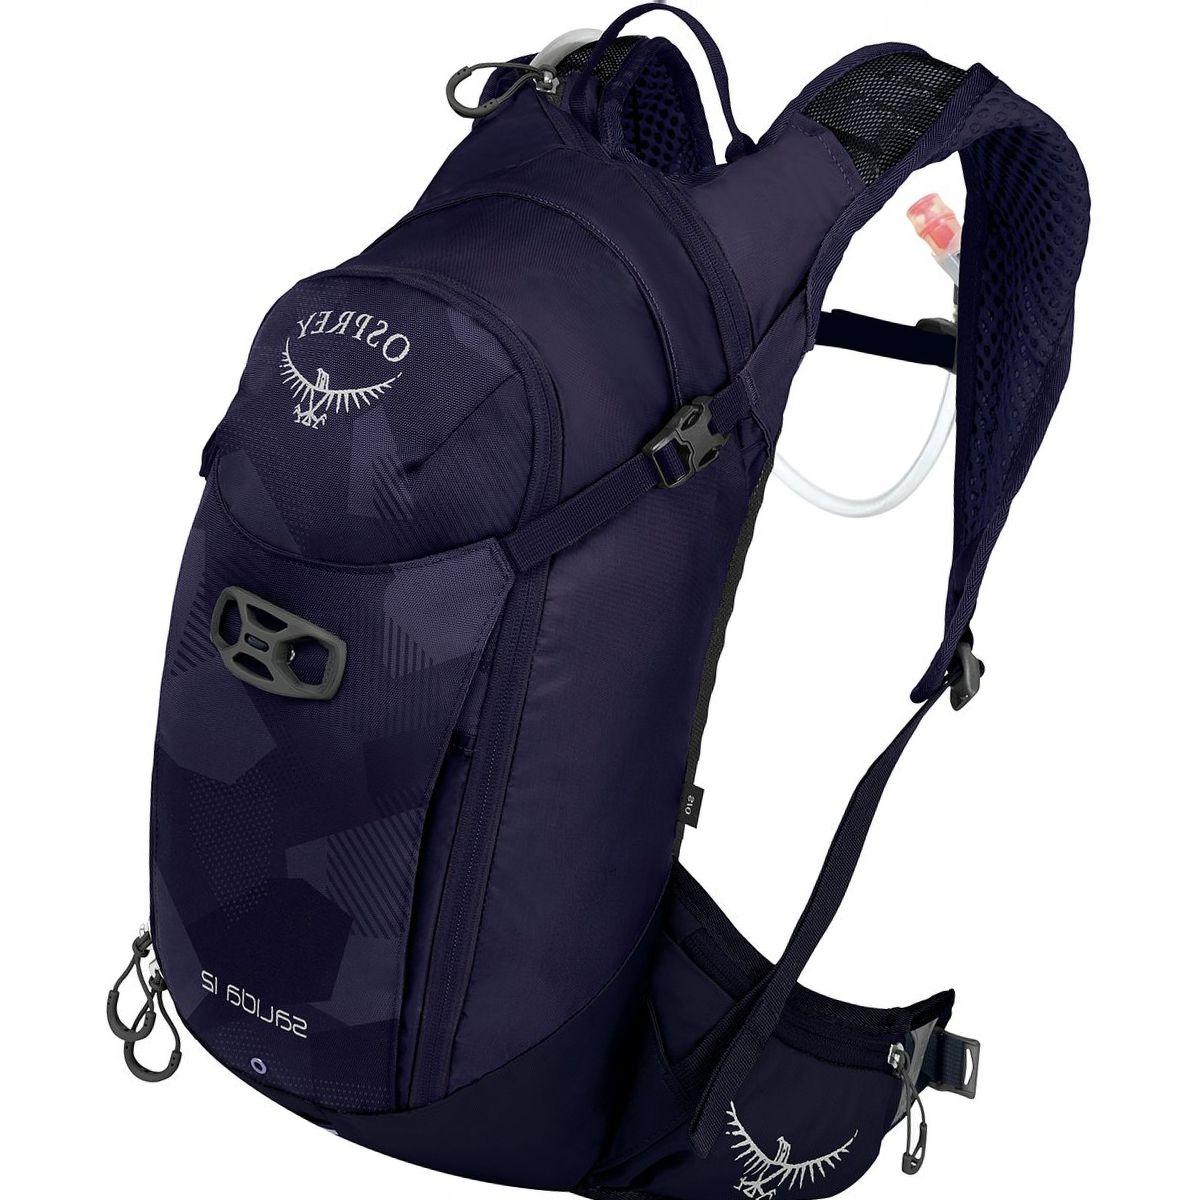 Osprey Packs Salida 12L Backpack - Women's